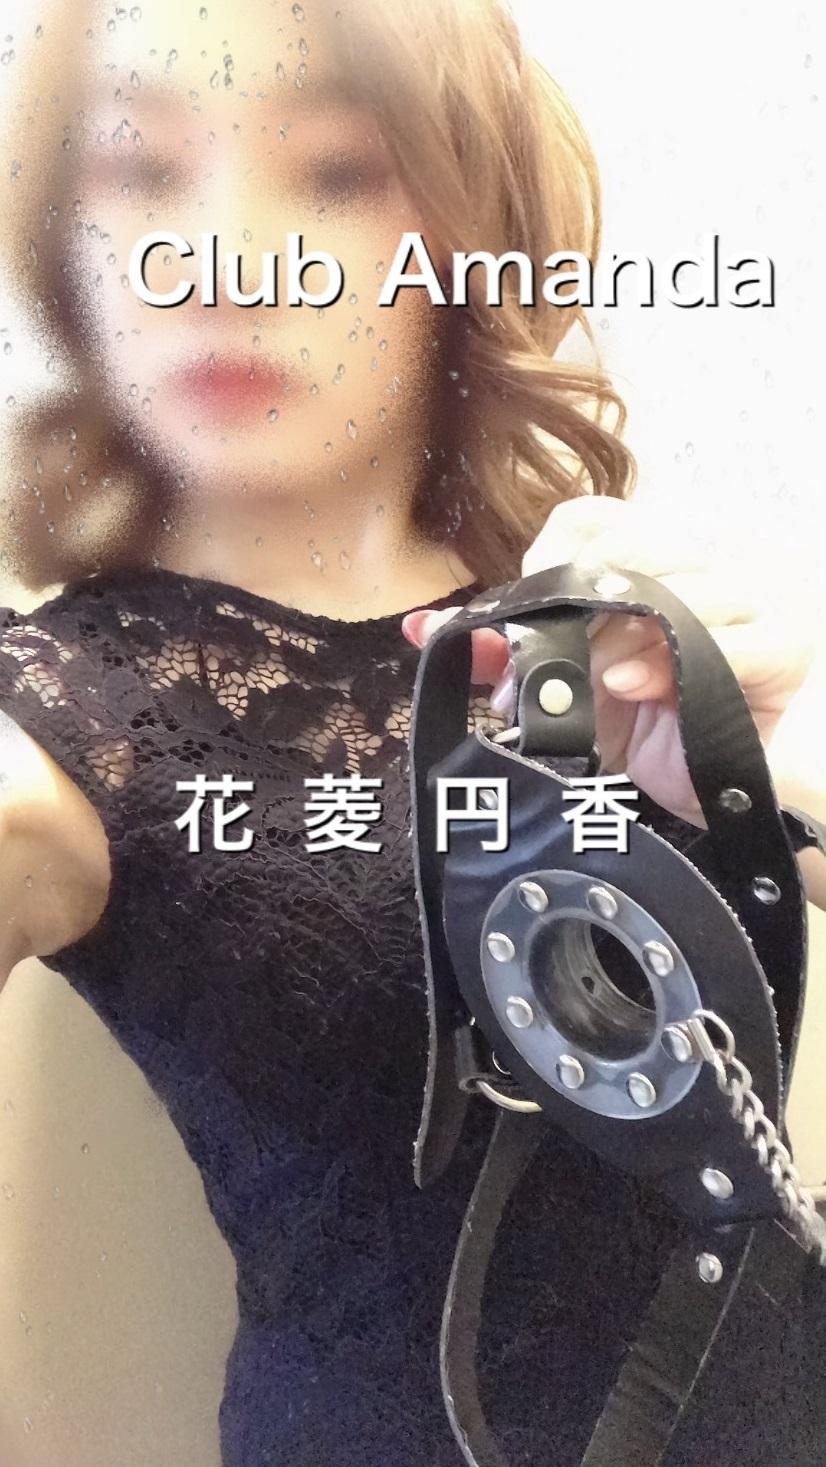 S__1611120701.jpg